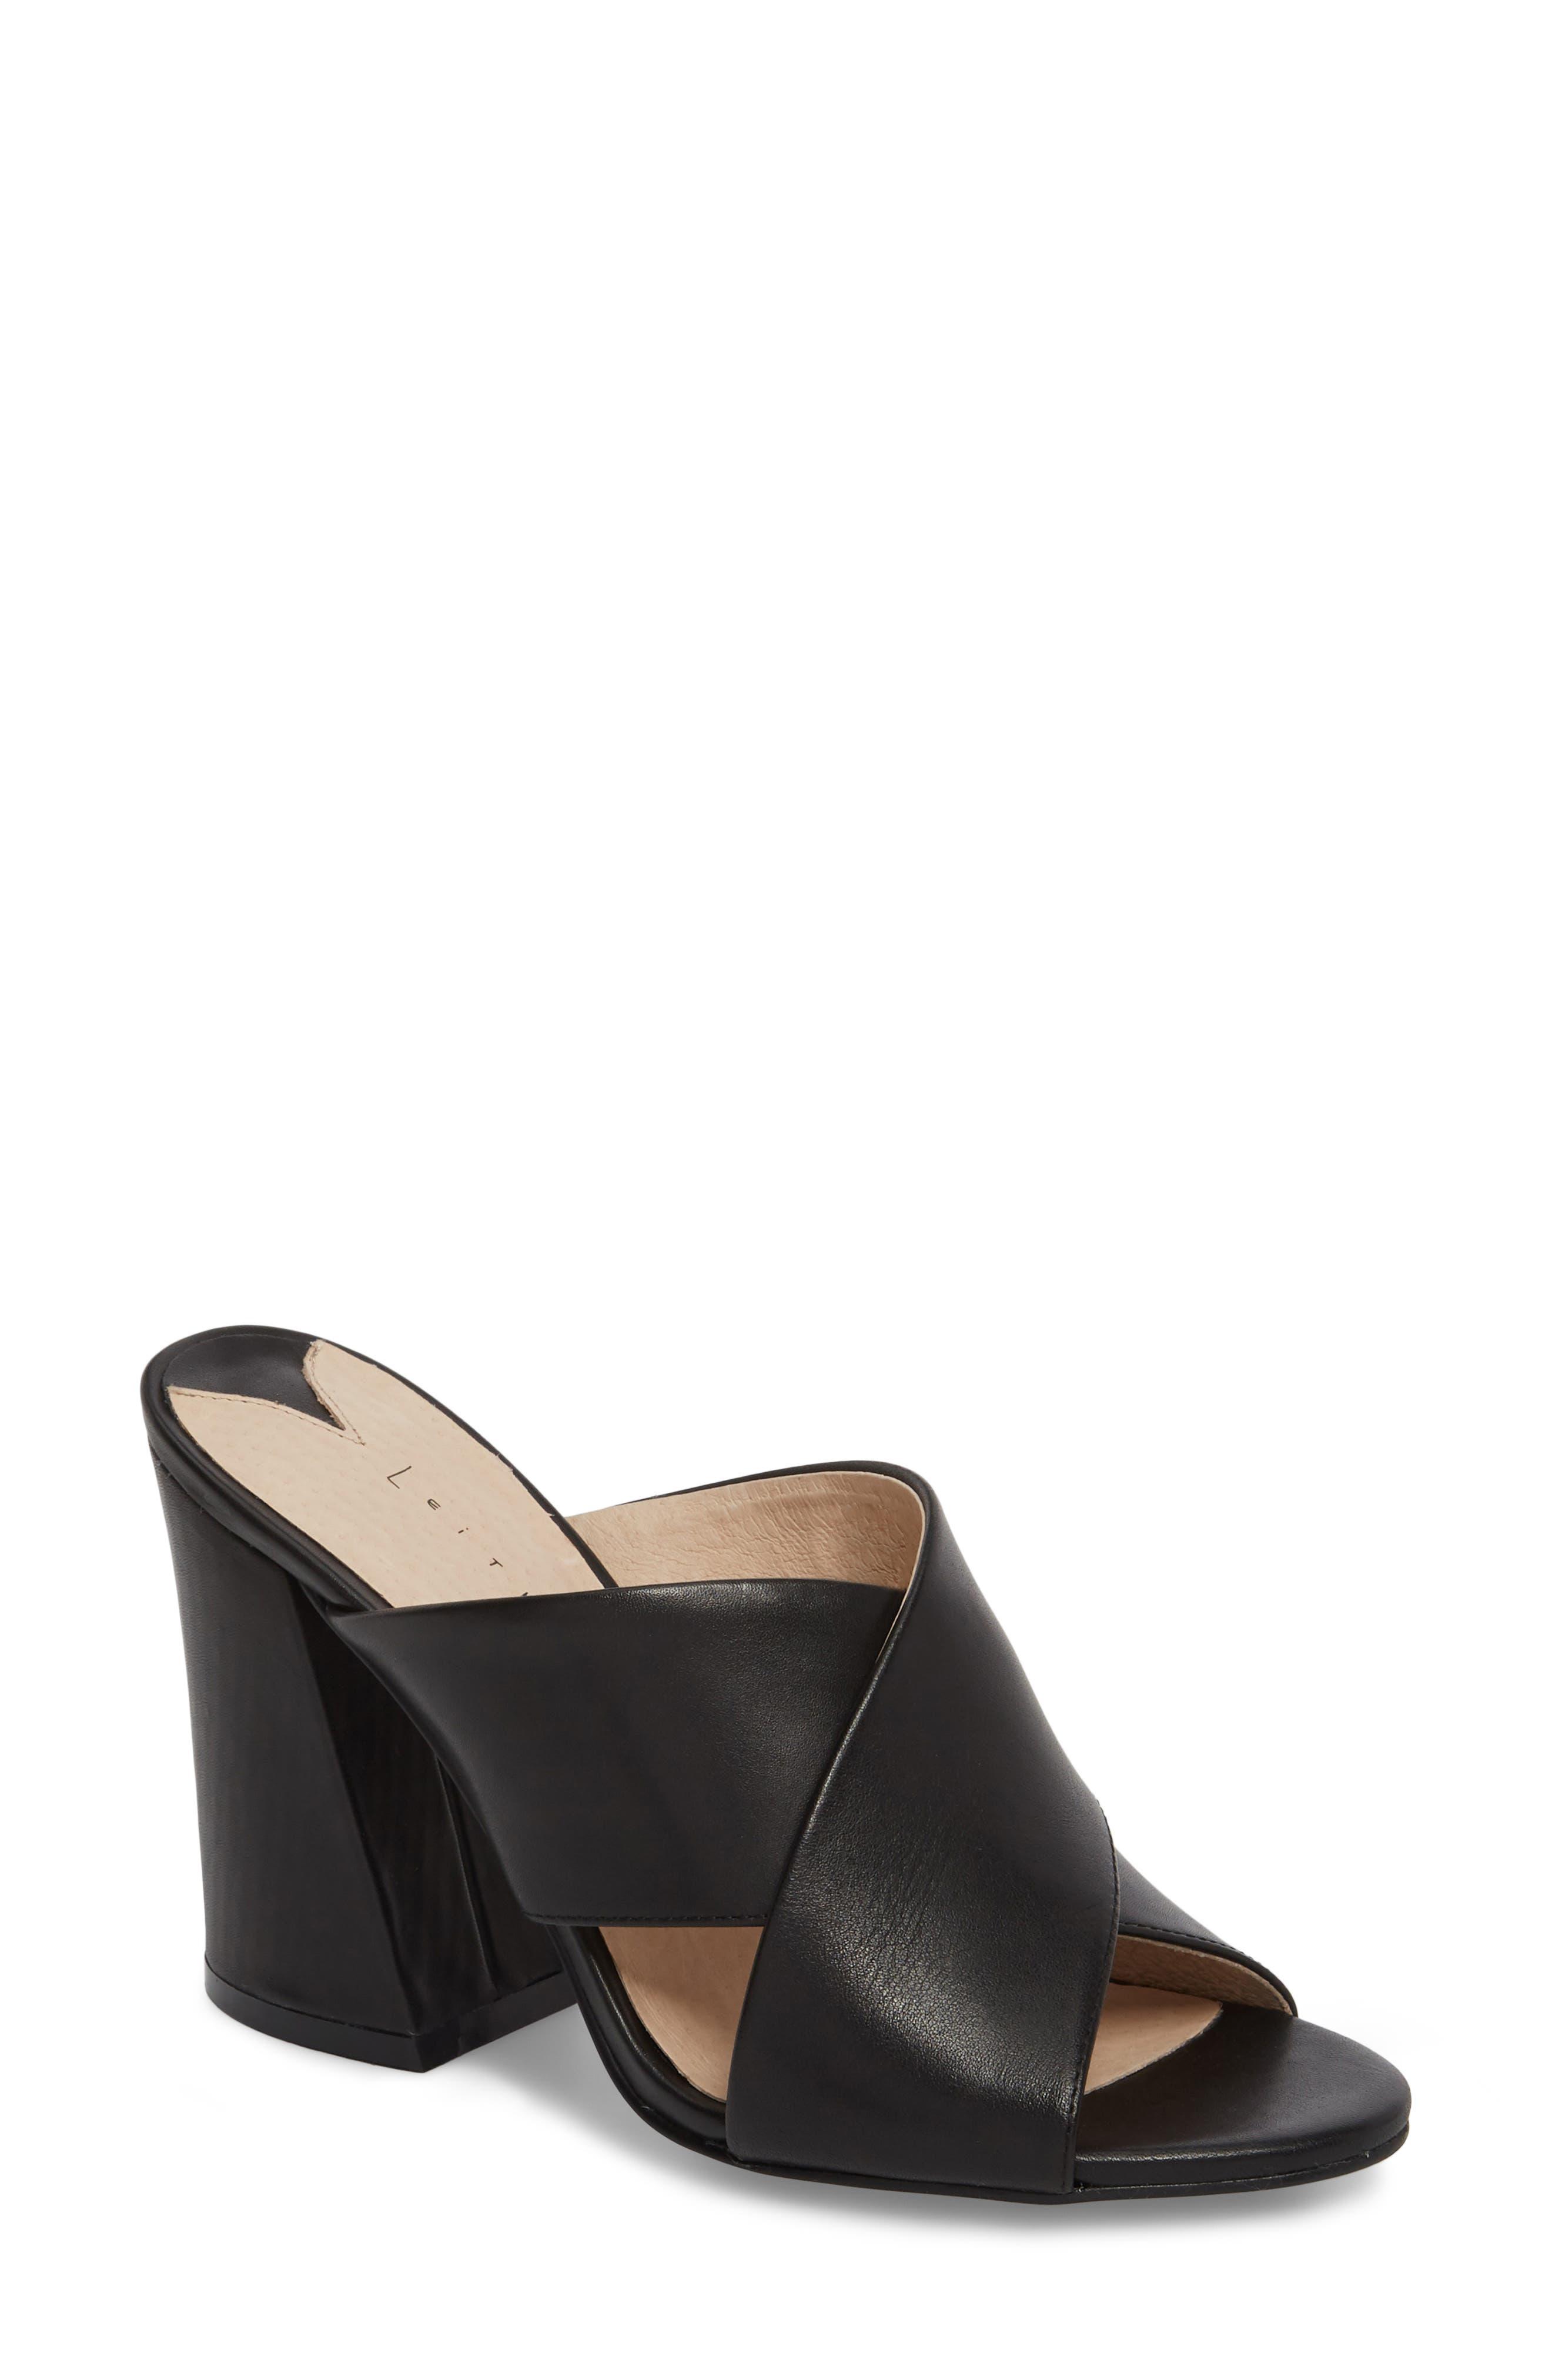 Cammie Block Heel Sandal by Leith